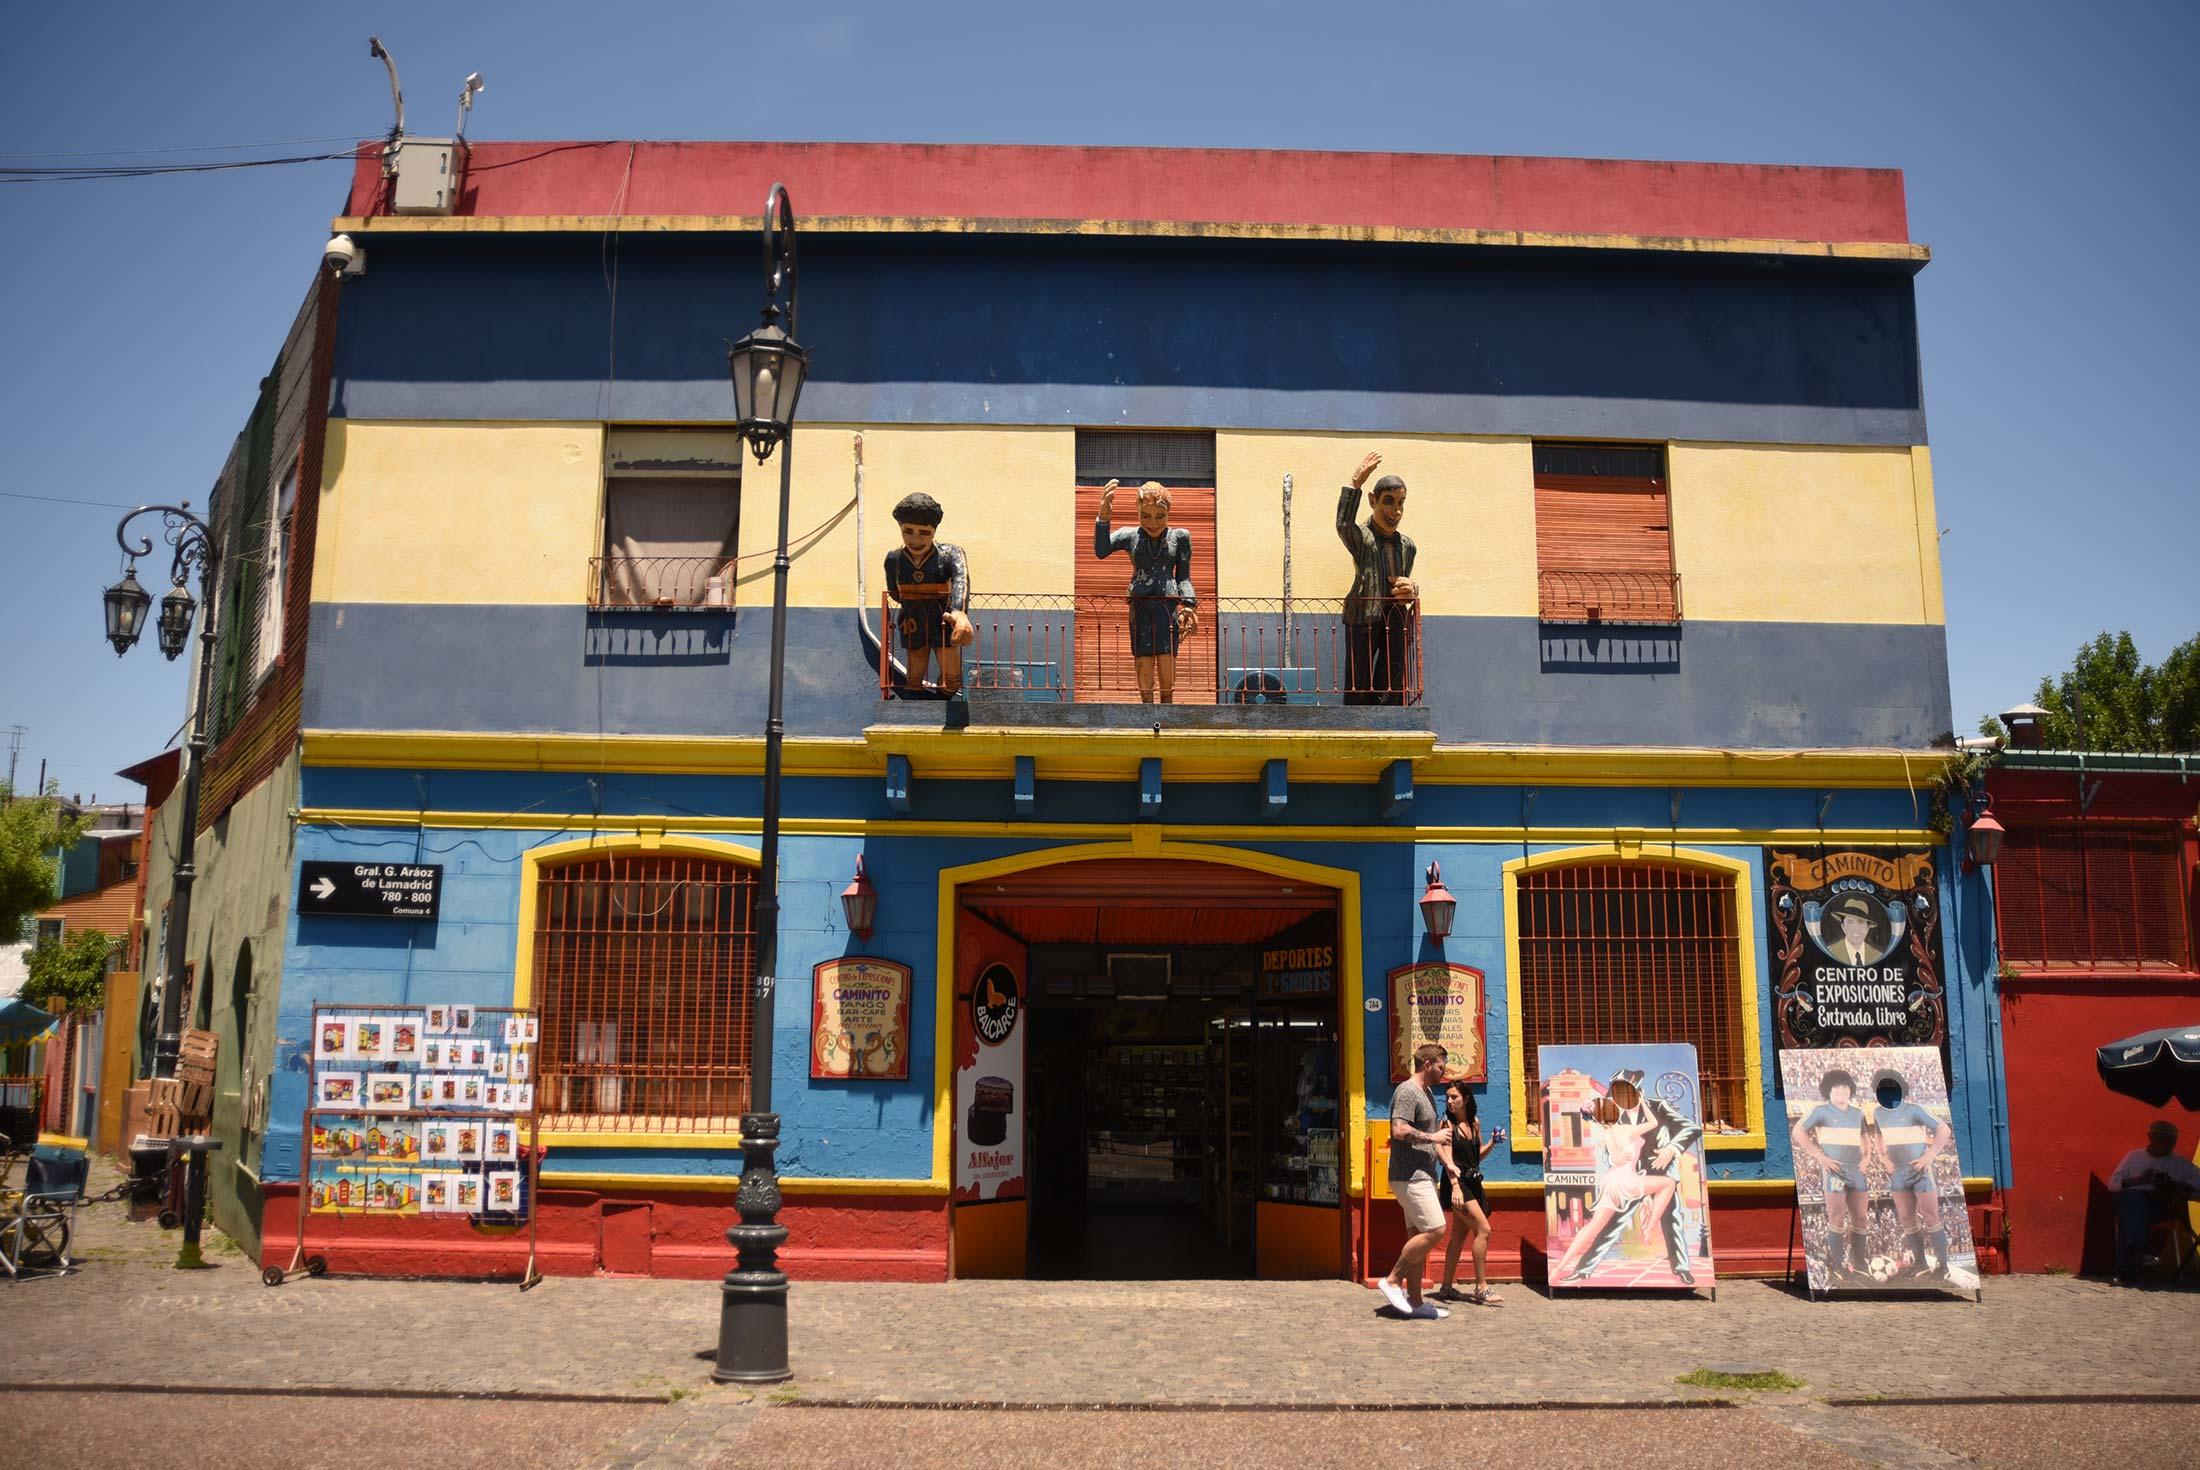 Epic Bolivia to Brazil 3